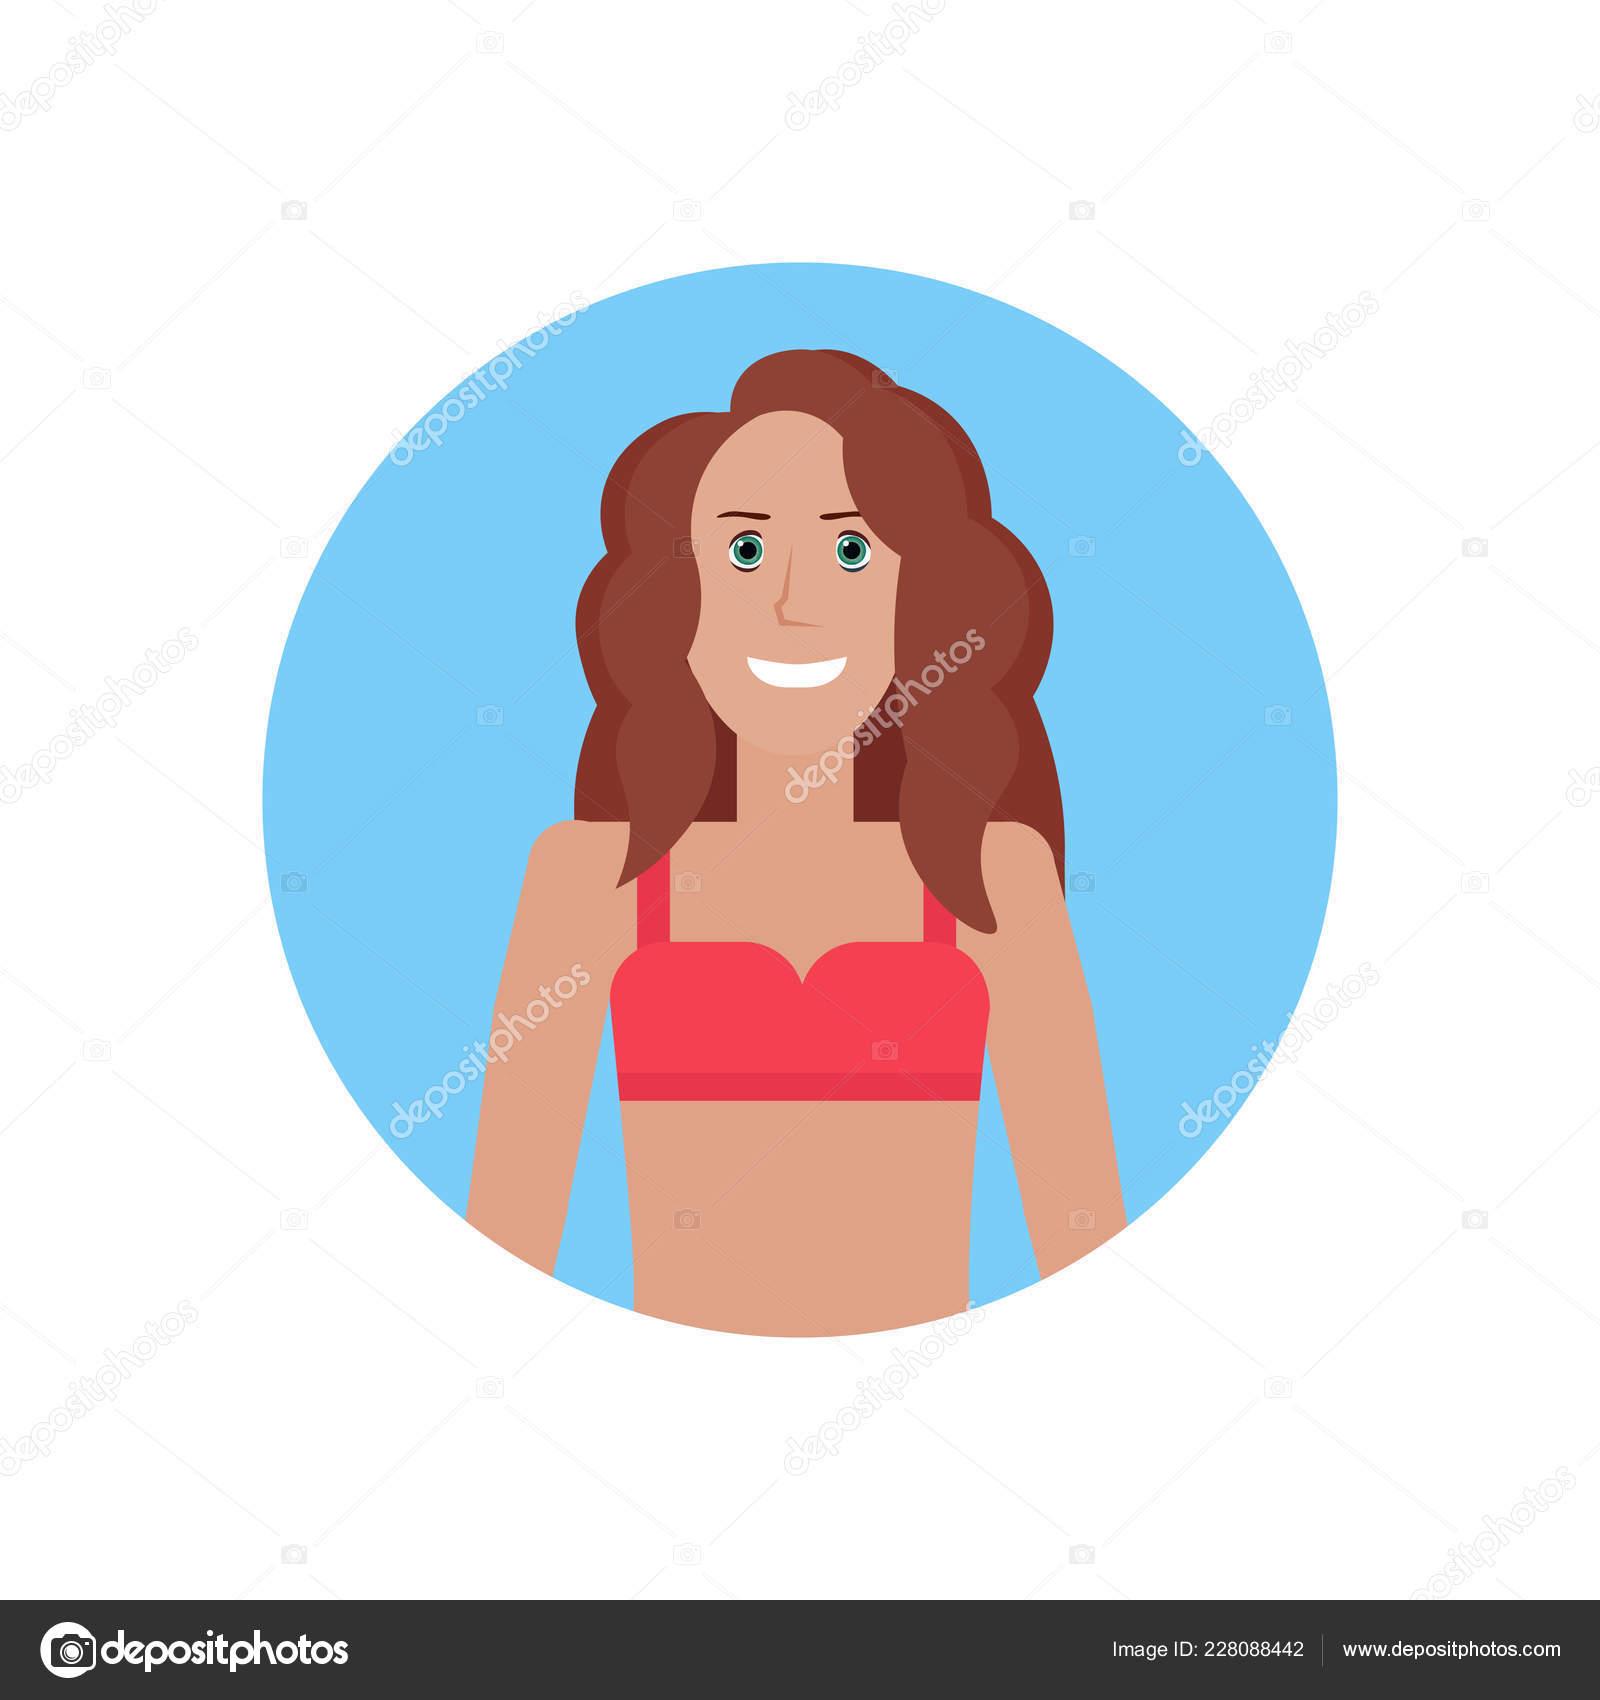 Bikini Jeune Femme Visage Avatar Fille En Maillot De Bain